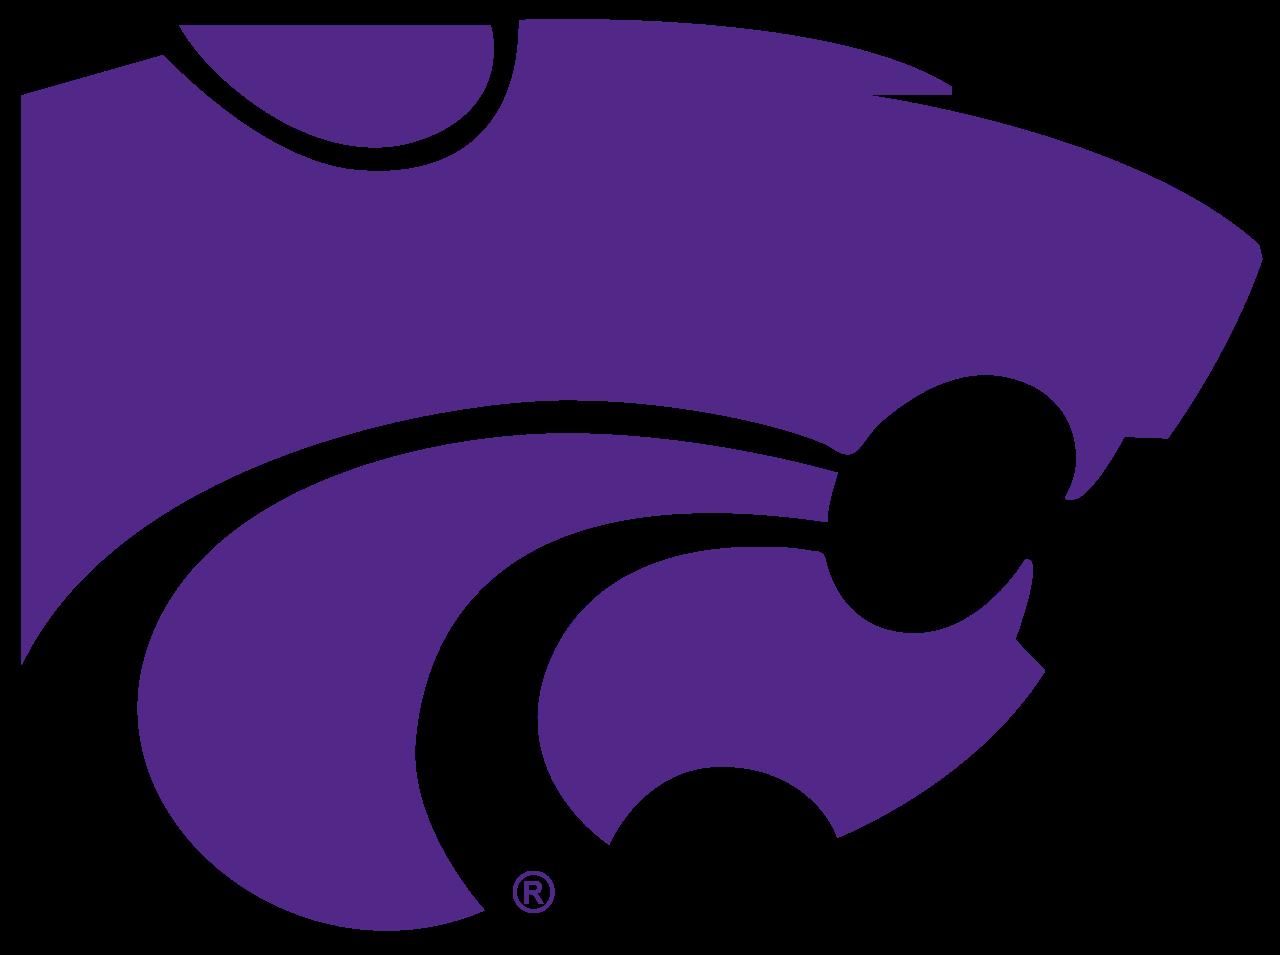 powercat logo Google Search Football america, Kansas state